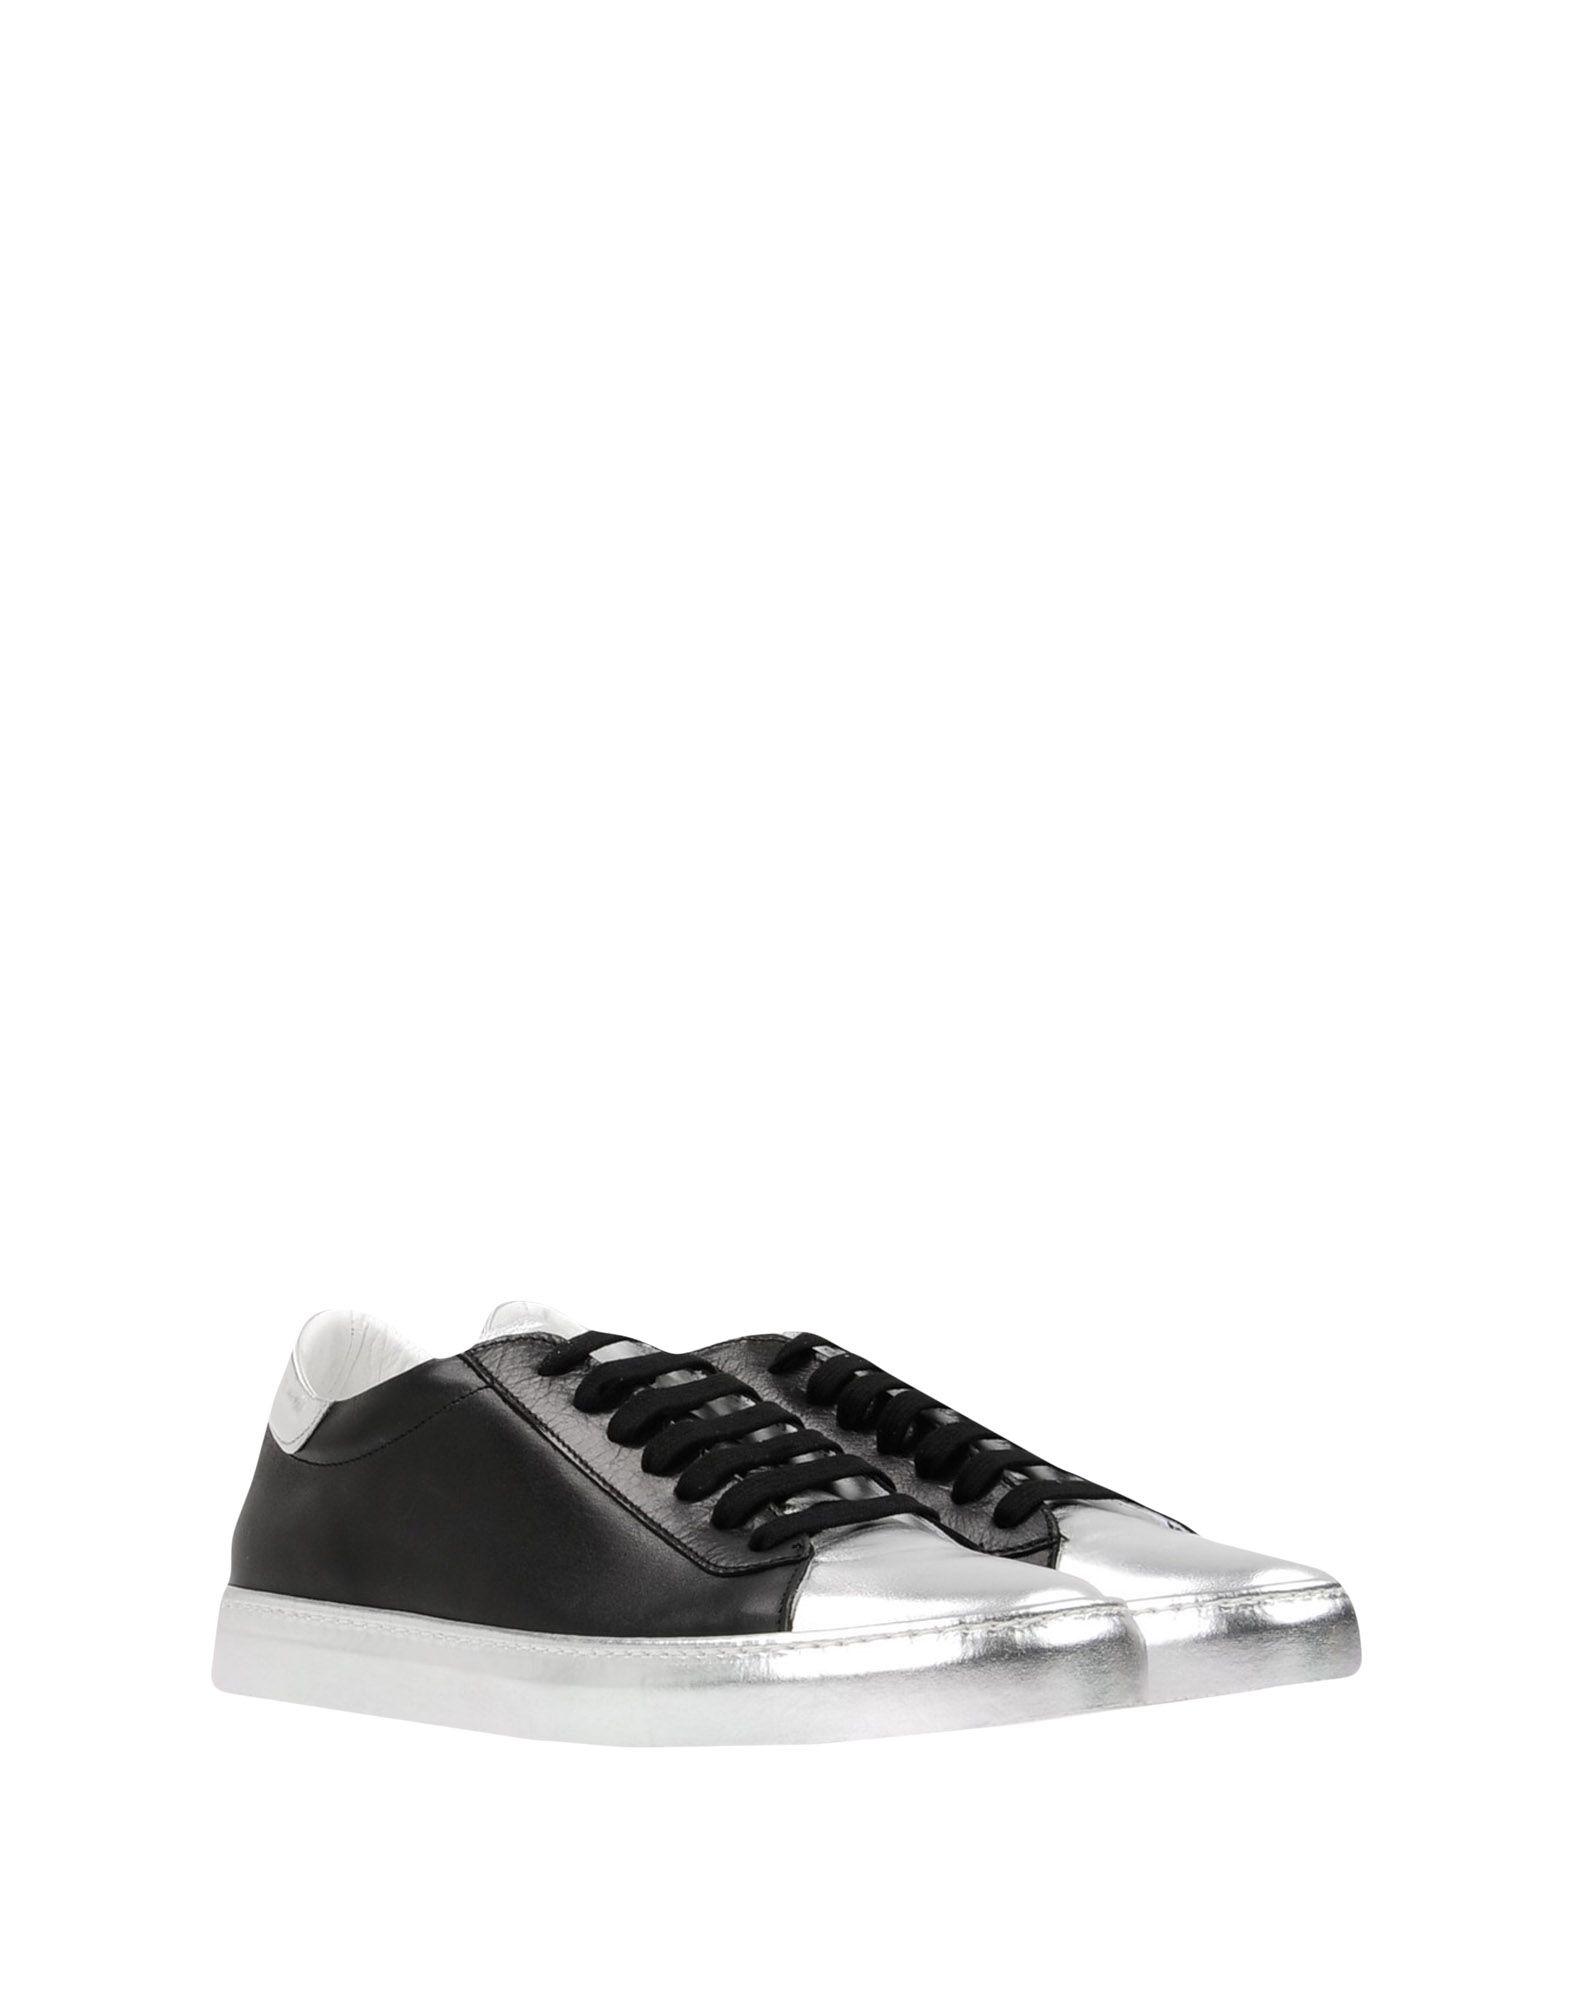 8 Sneakers Herren  11391425XT Heiße Schuhe Schuhe Heiße 6df568